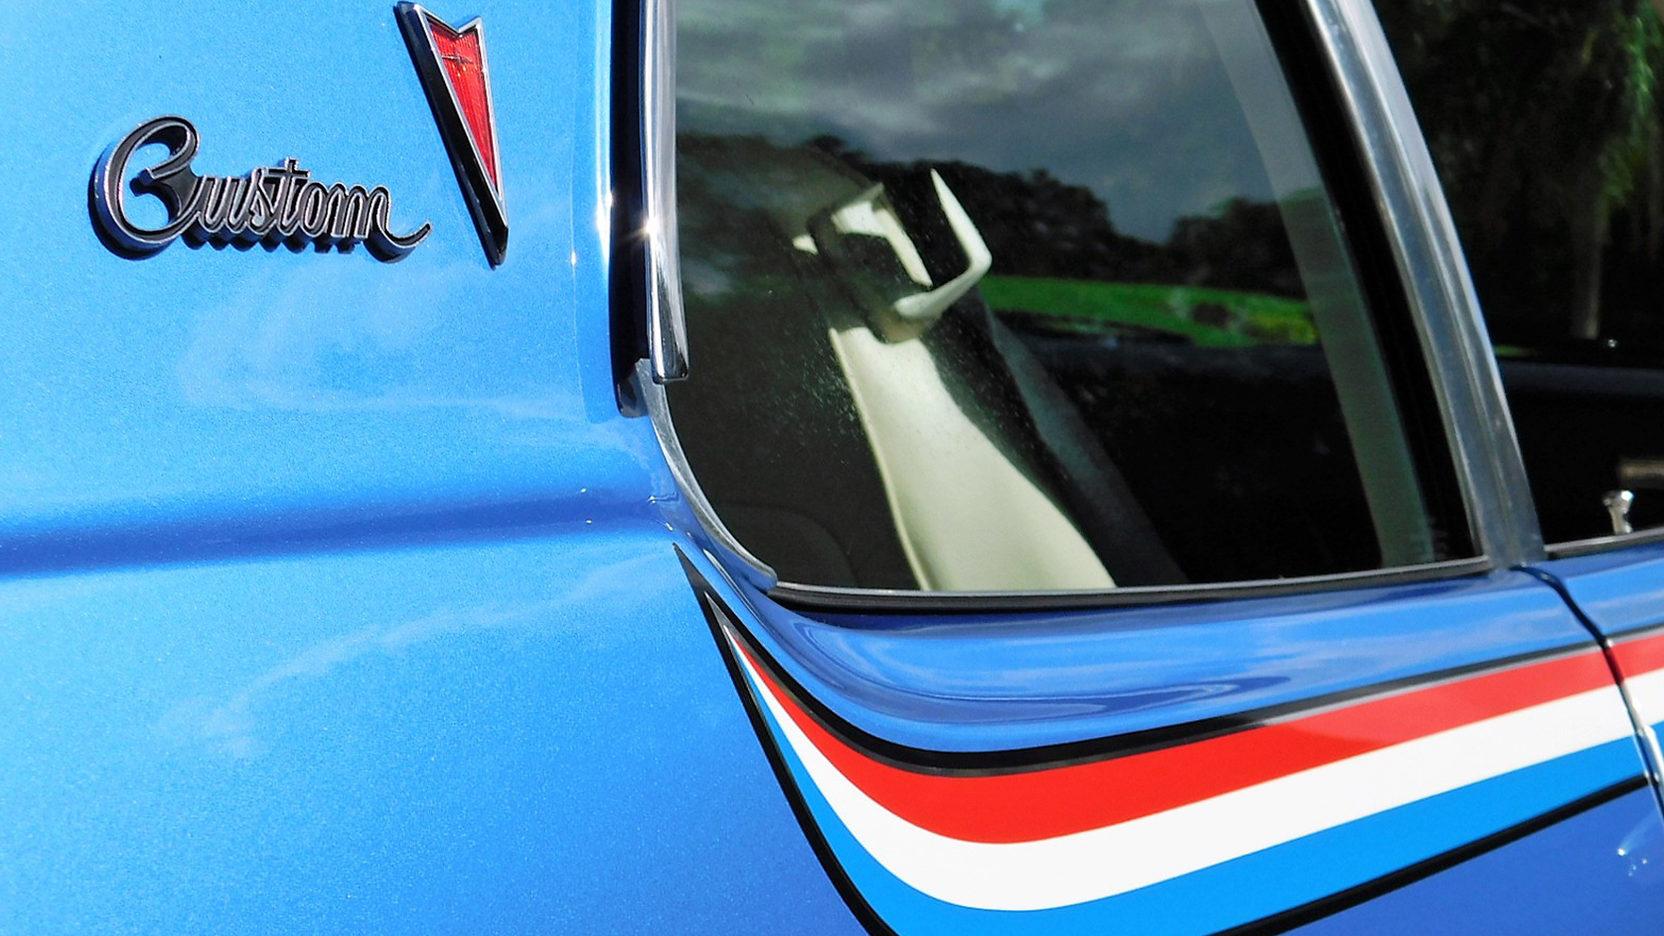 1974 Pontiac GTO badge